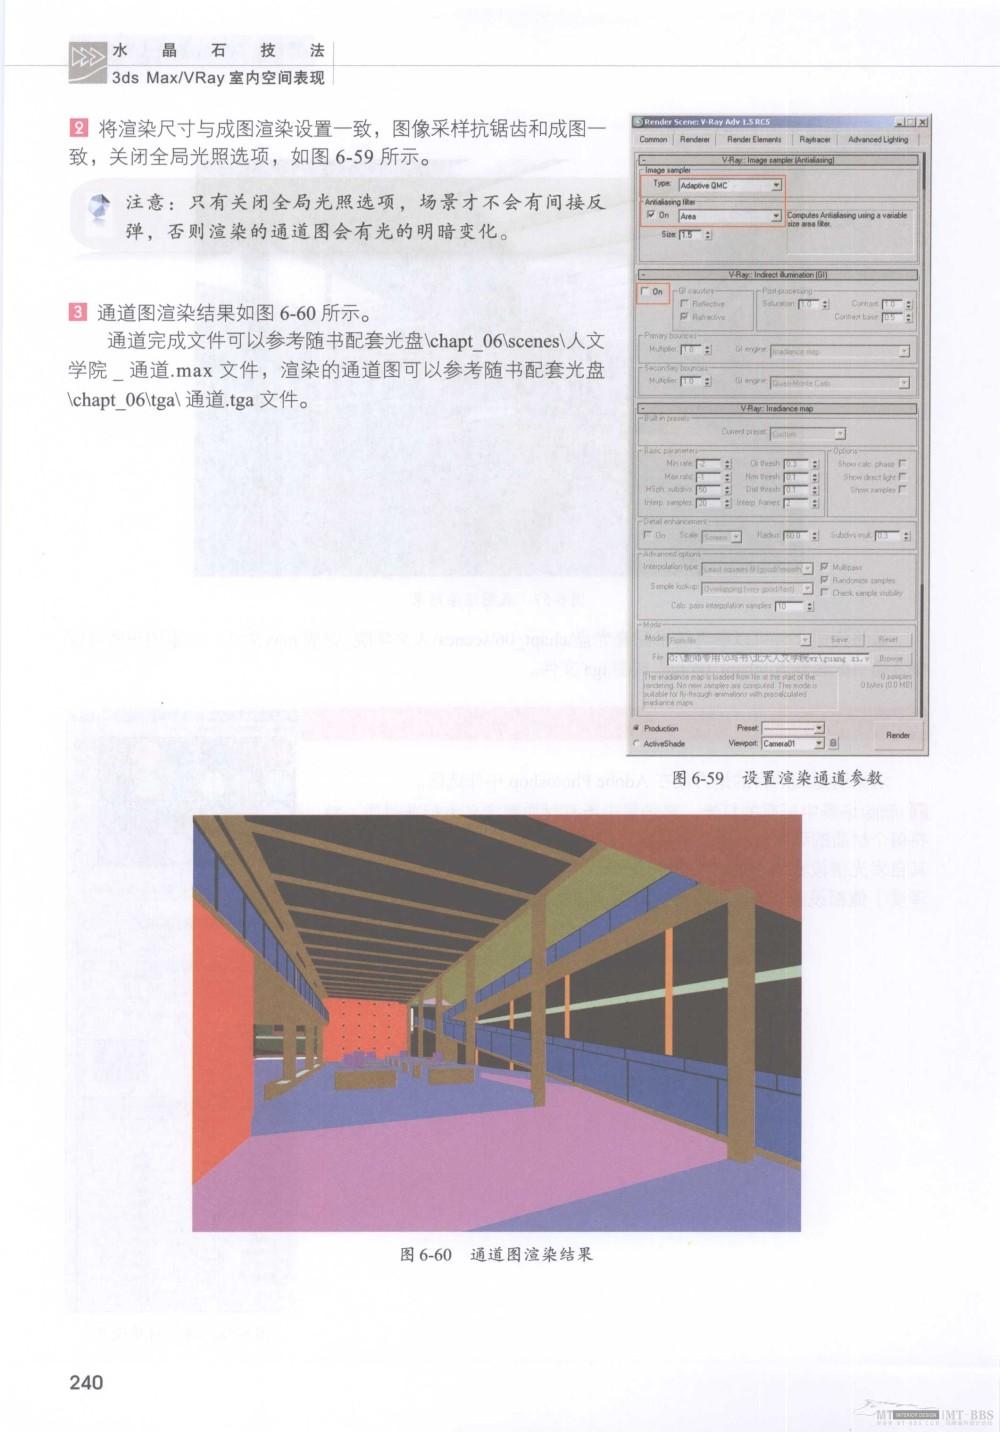 水晶石技法-3ds_Max&VRay室内空间表现_水晶石技法-3ds_Max&VRay室内空间表现_页面_246.jpg